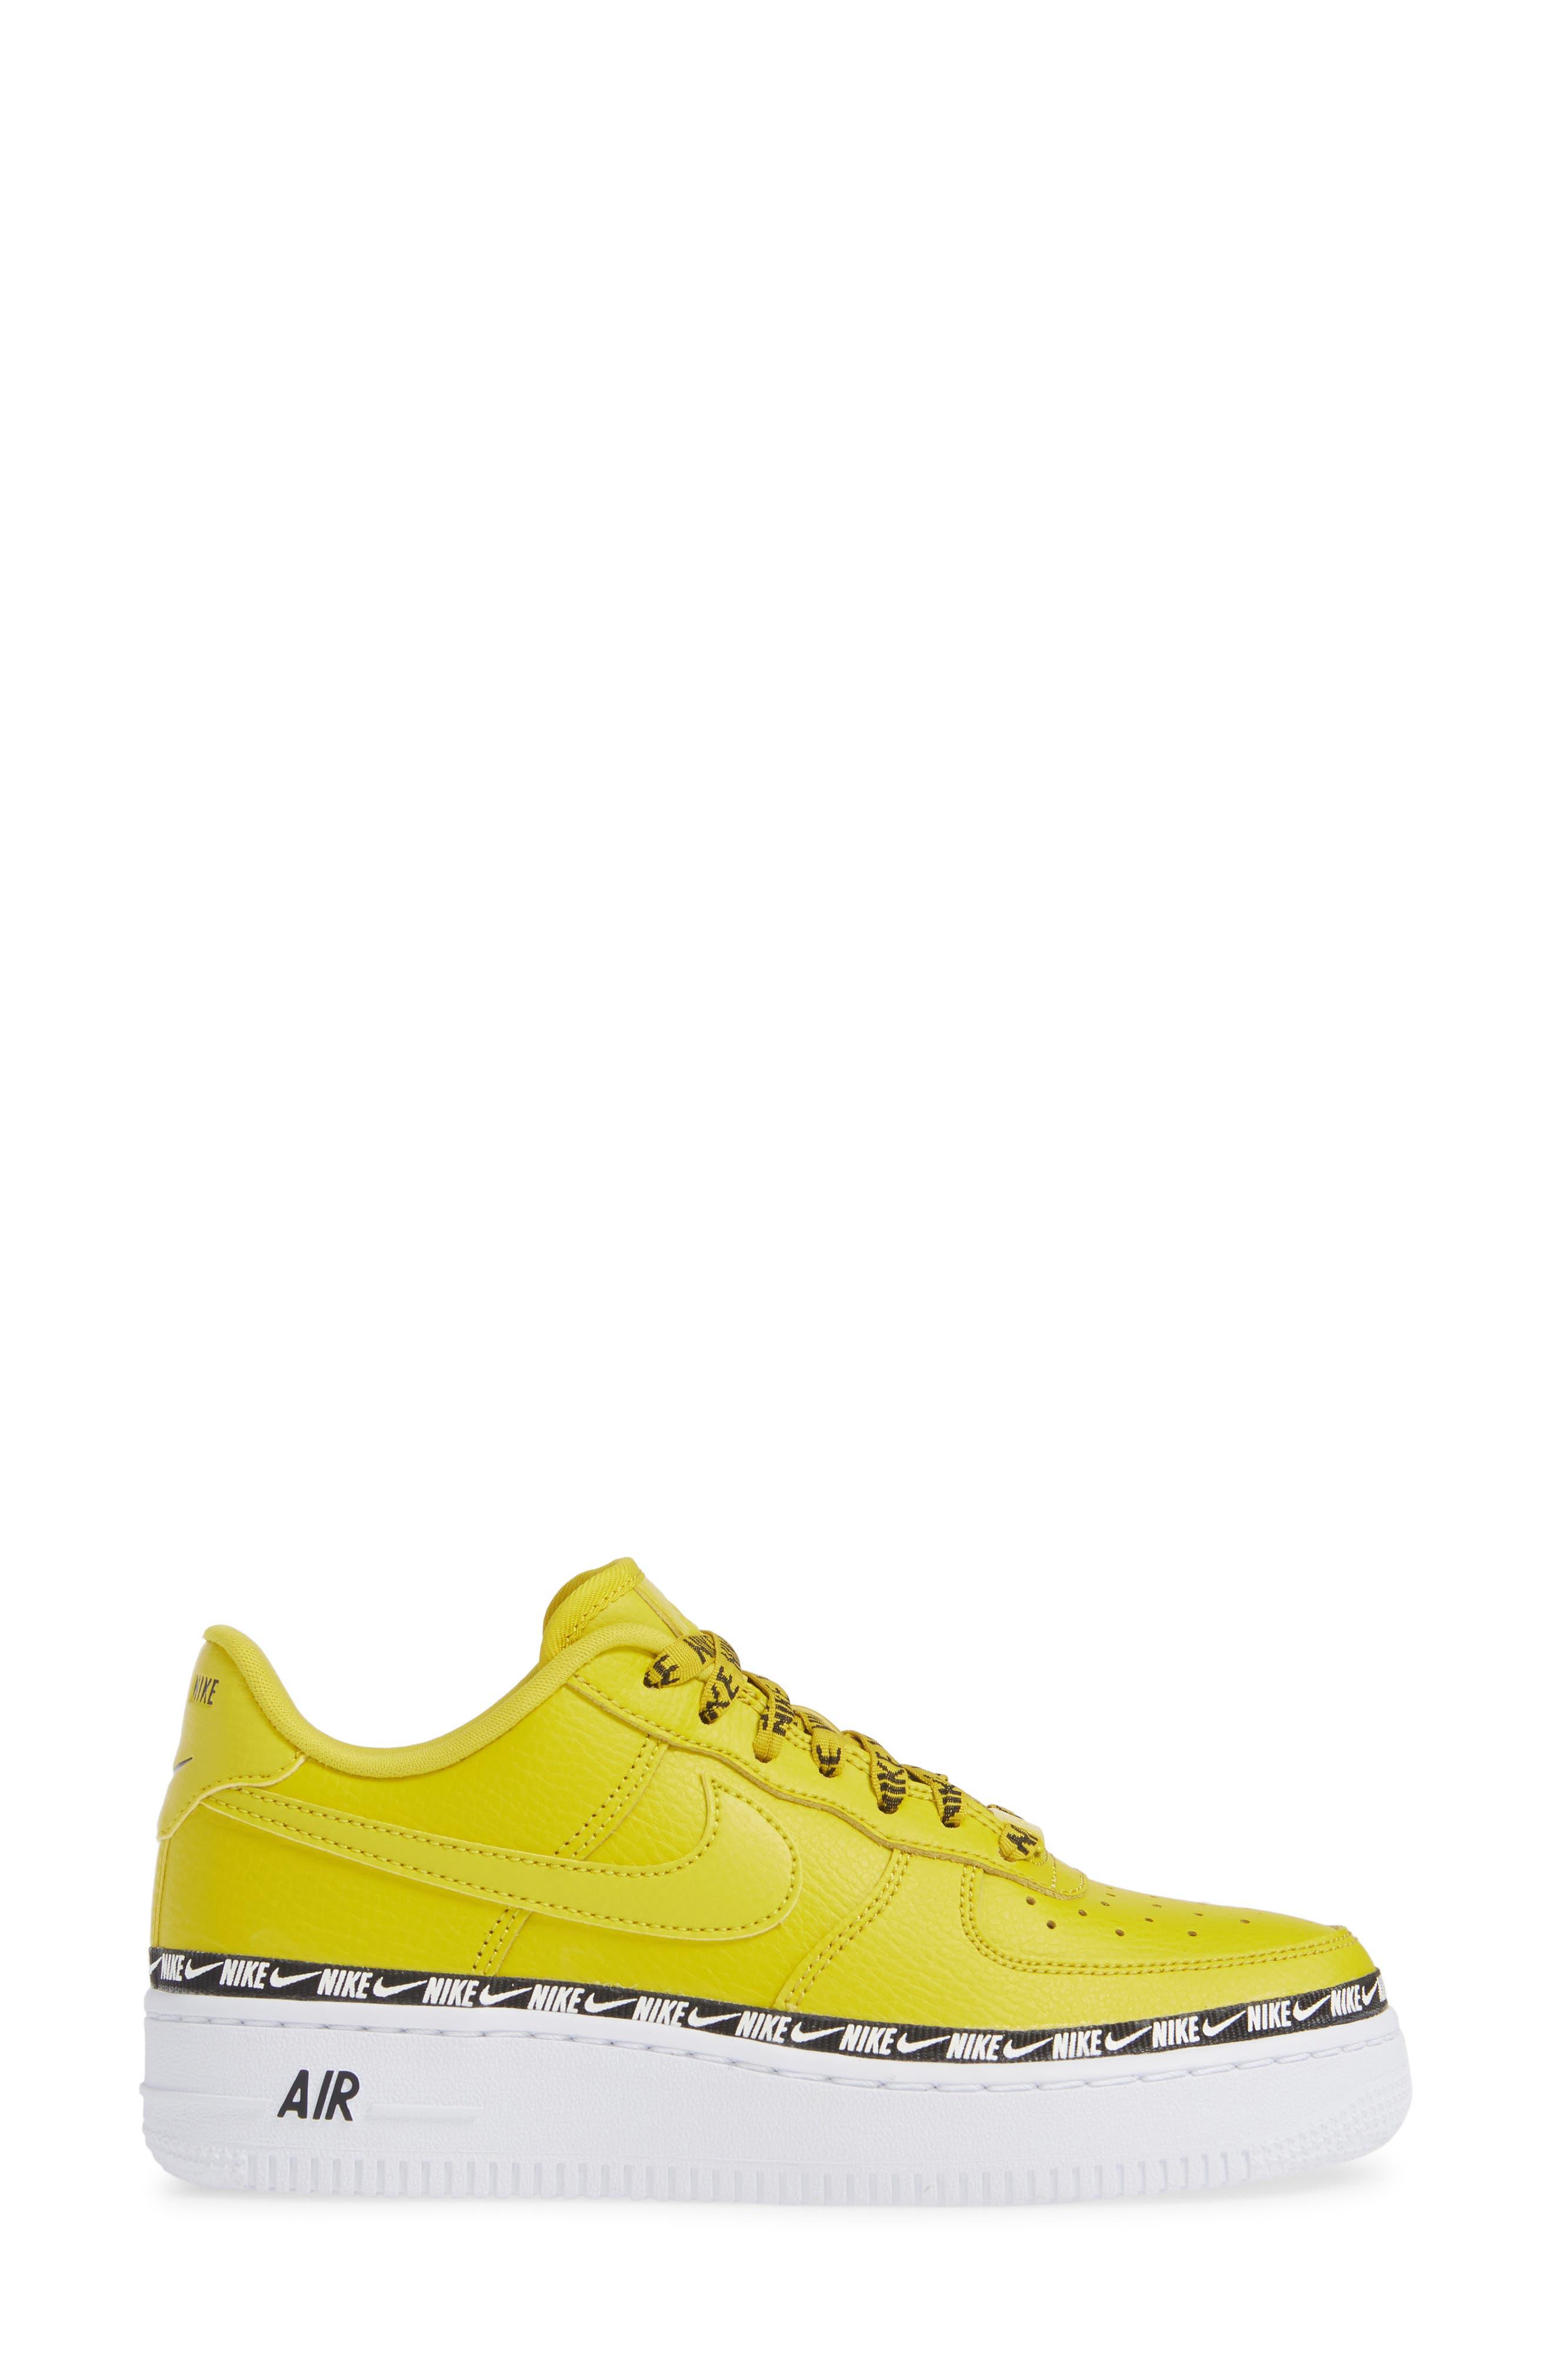 Air Force 1 '07 SE Premium Sneaker,                             Alternate thumbnail 3, color,                             BRIGHT CITRON/ BLACK/ WHITE